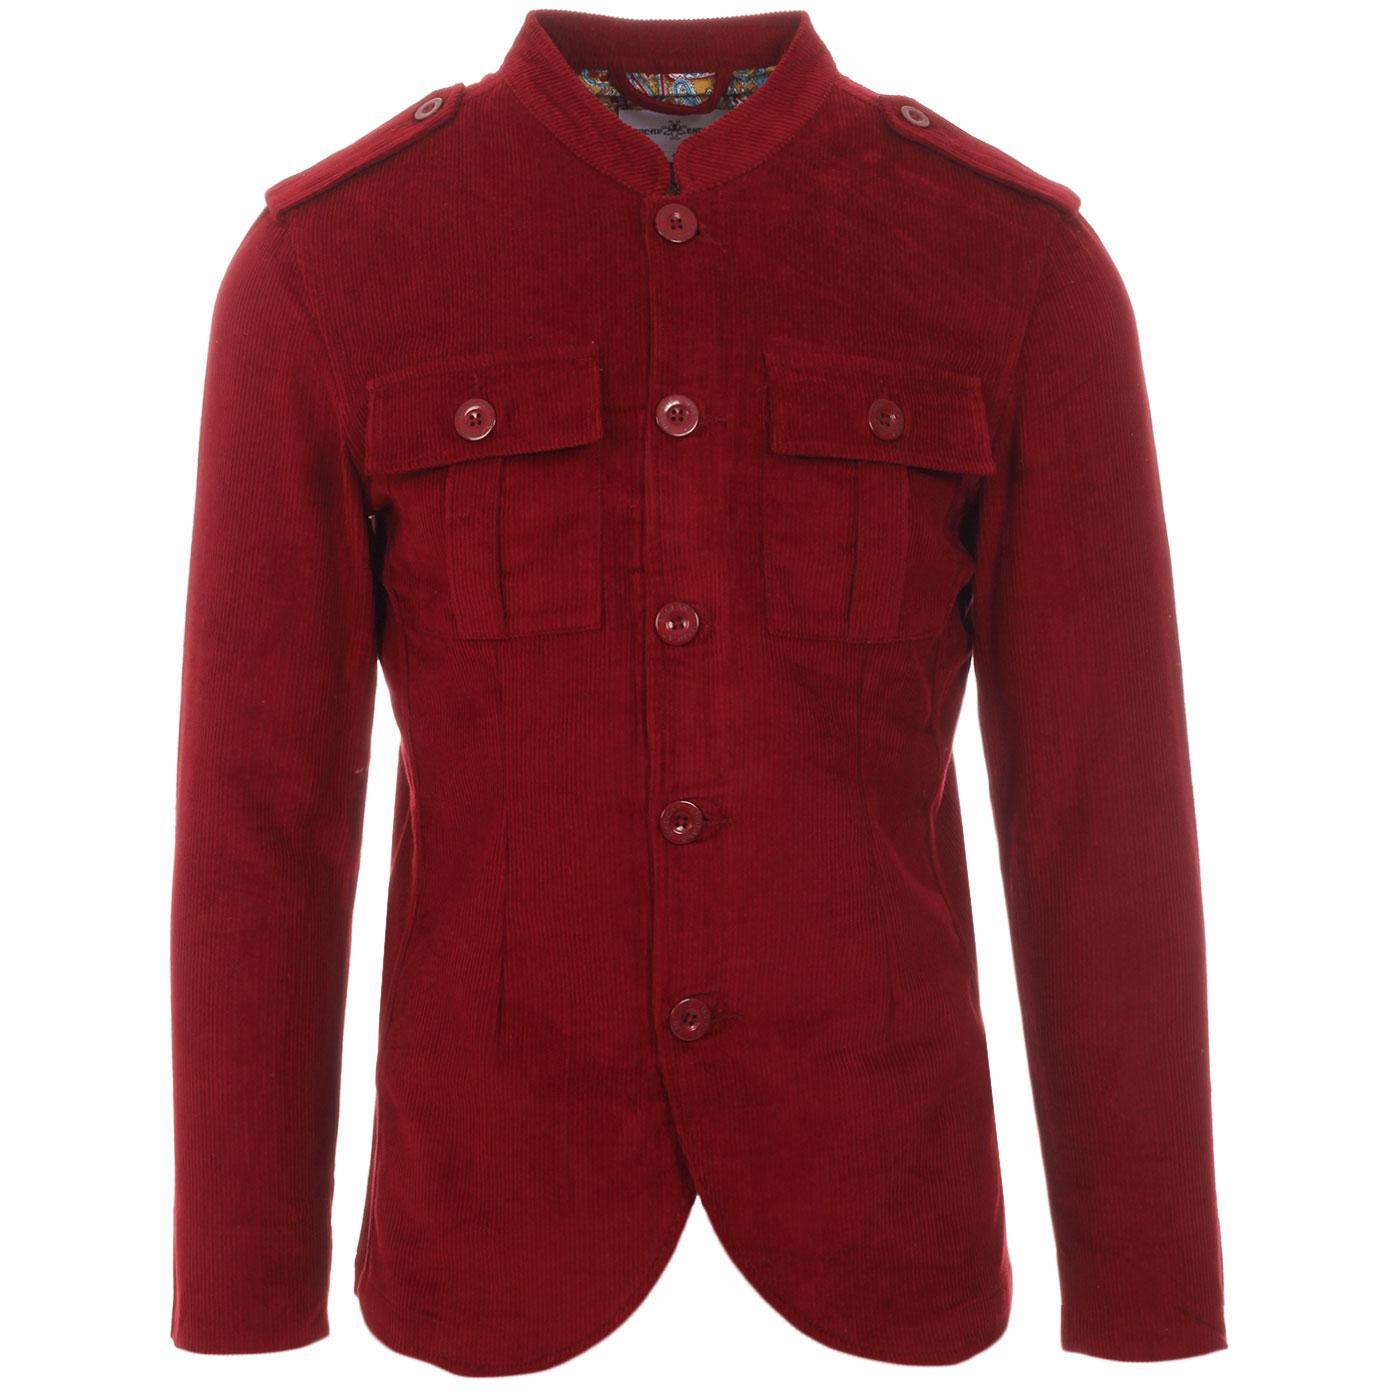 Pepper MADCAP ENGLAND Mod Cord Tunic Jacket (TP)